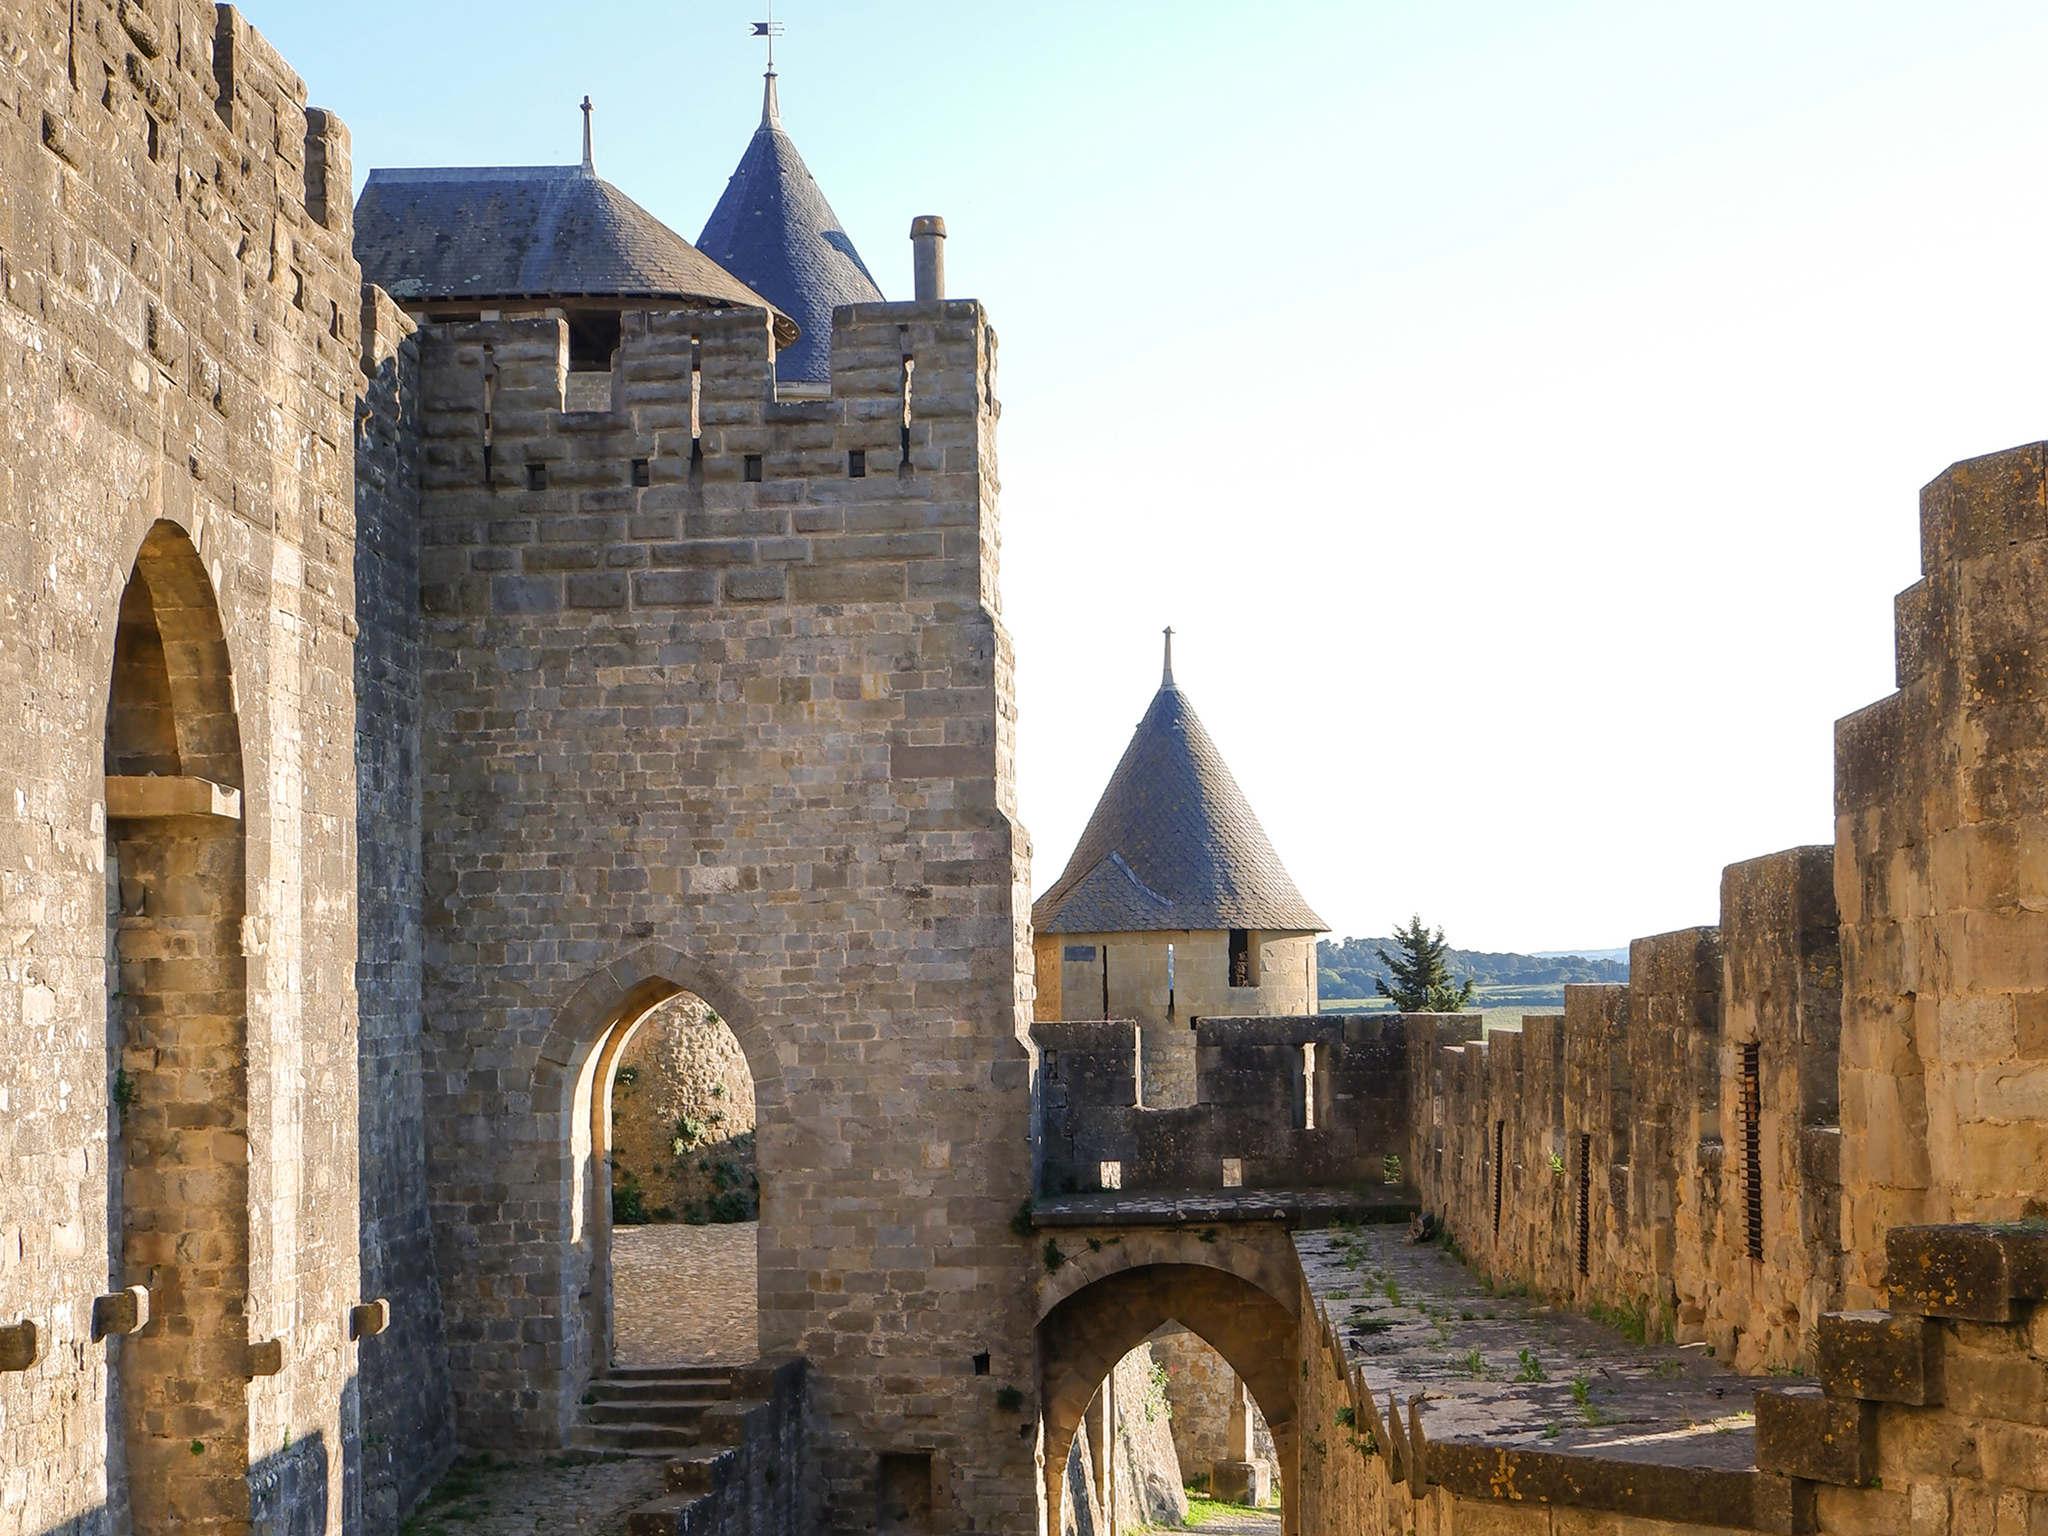 Hotel in CARCASSONNE ibis Carcassonne East La Cite